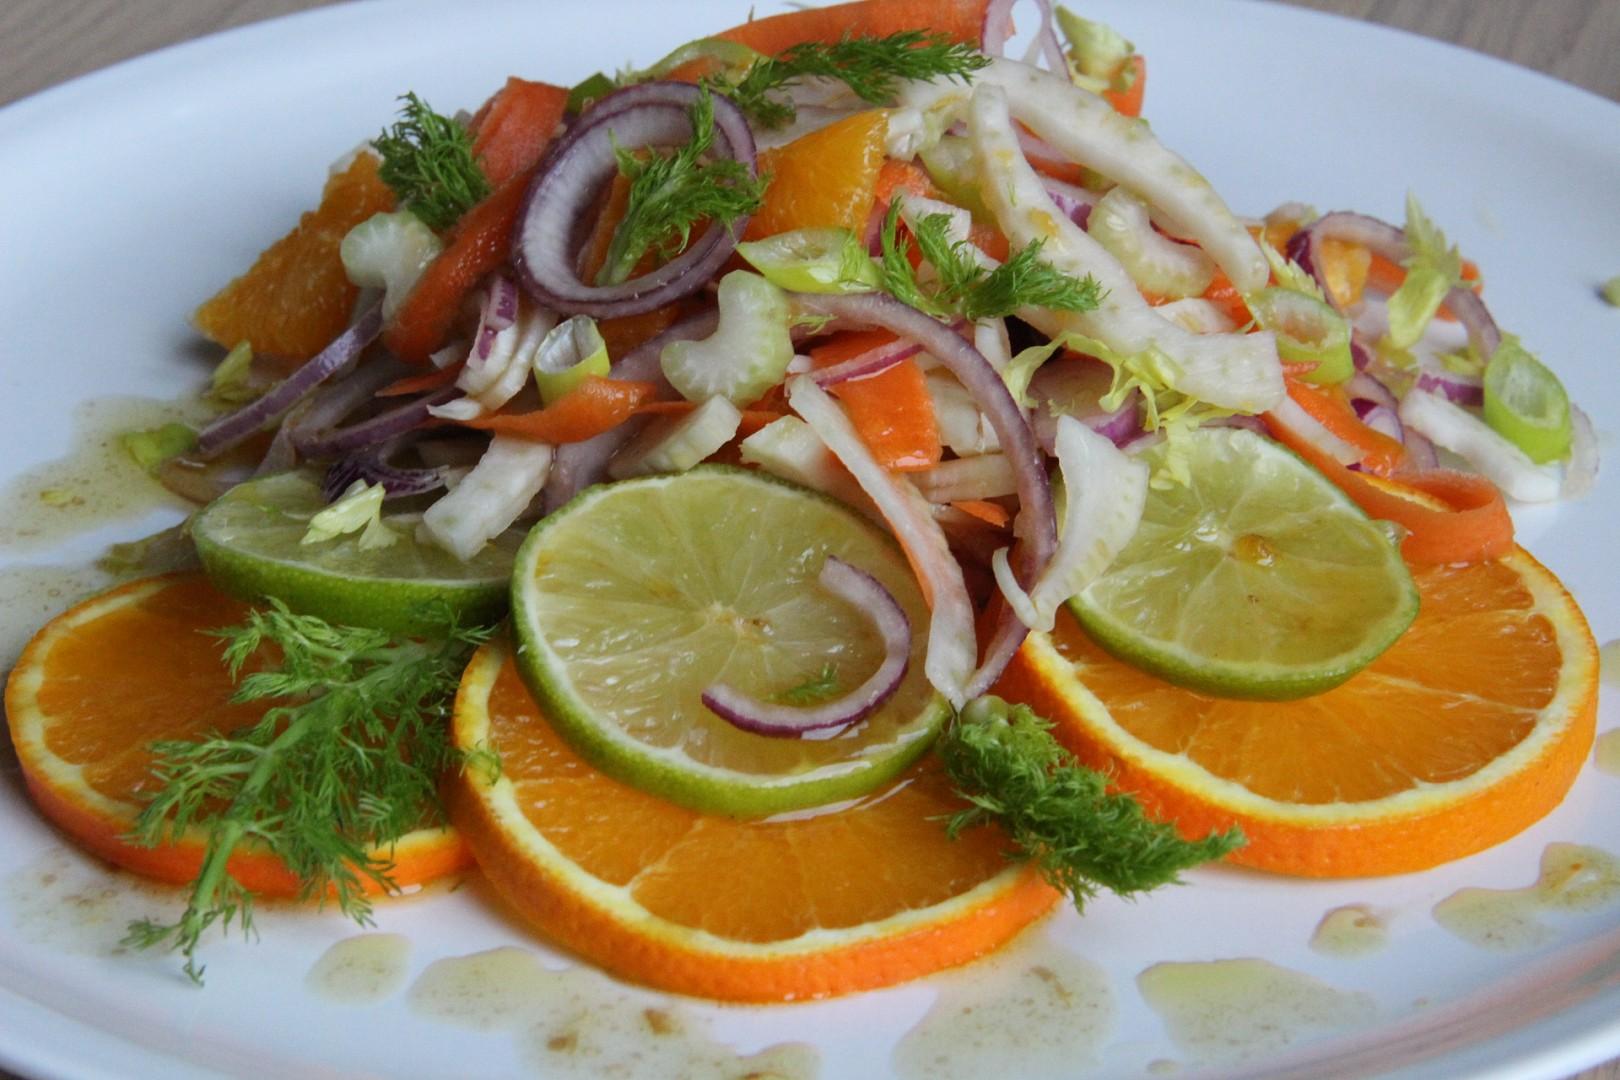 Salát z fenyklu a pomeranče s medovo - limetkovou zálivkou